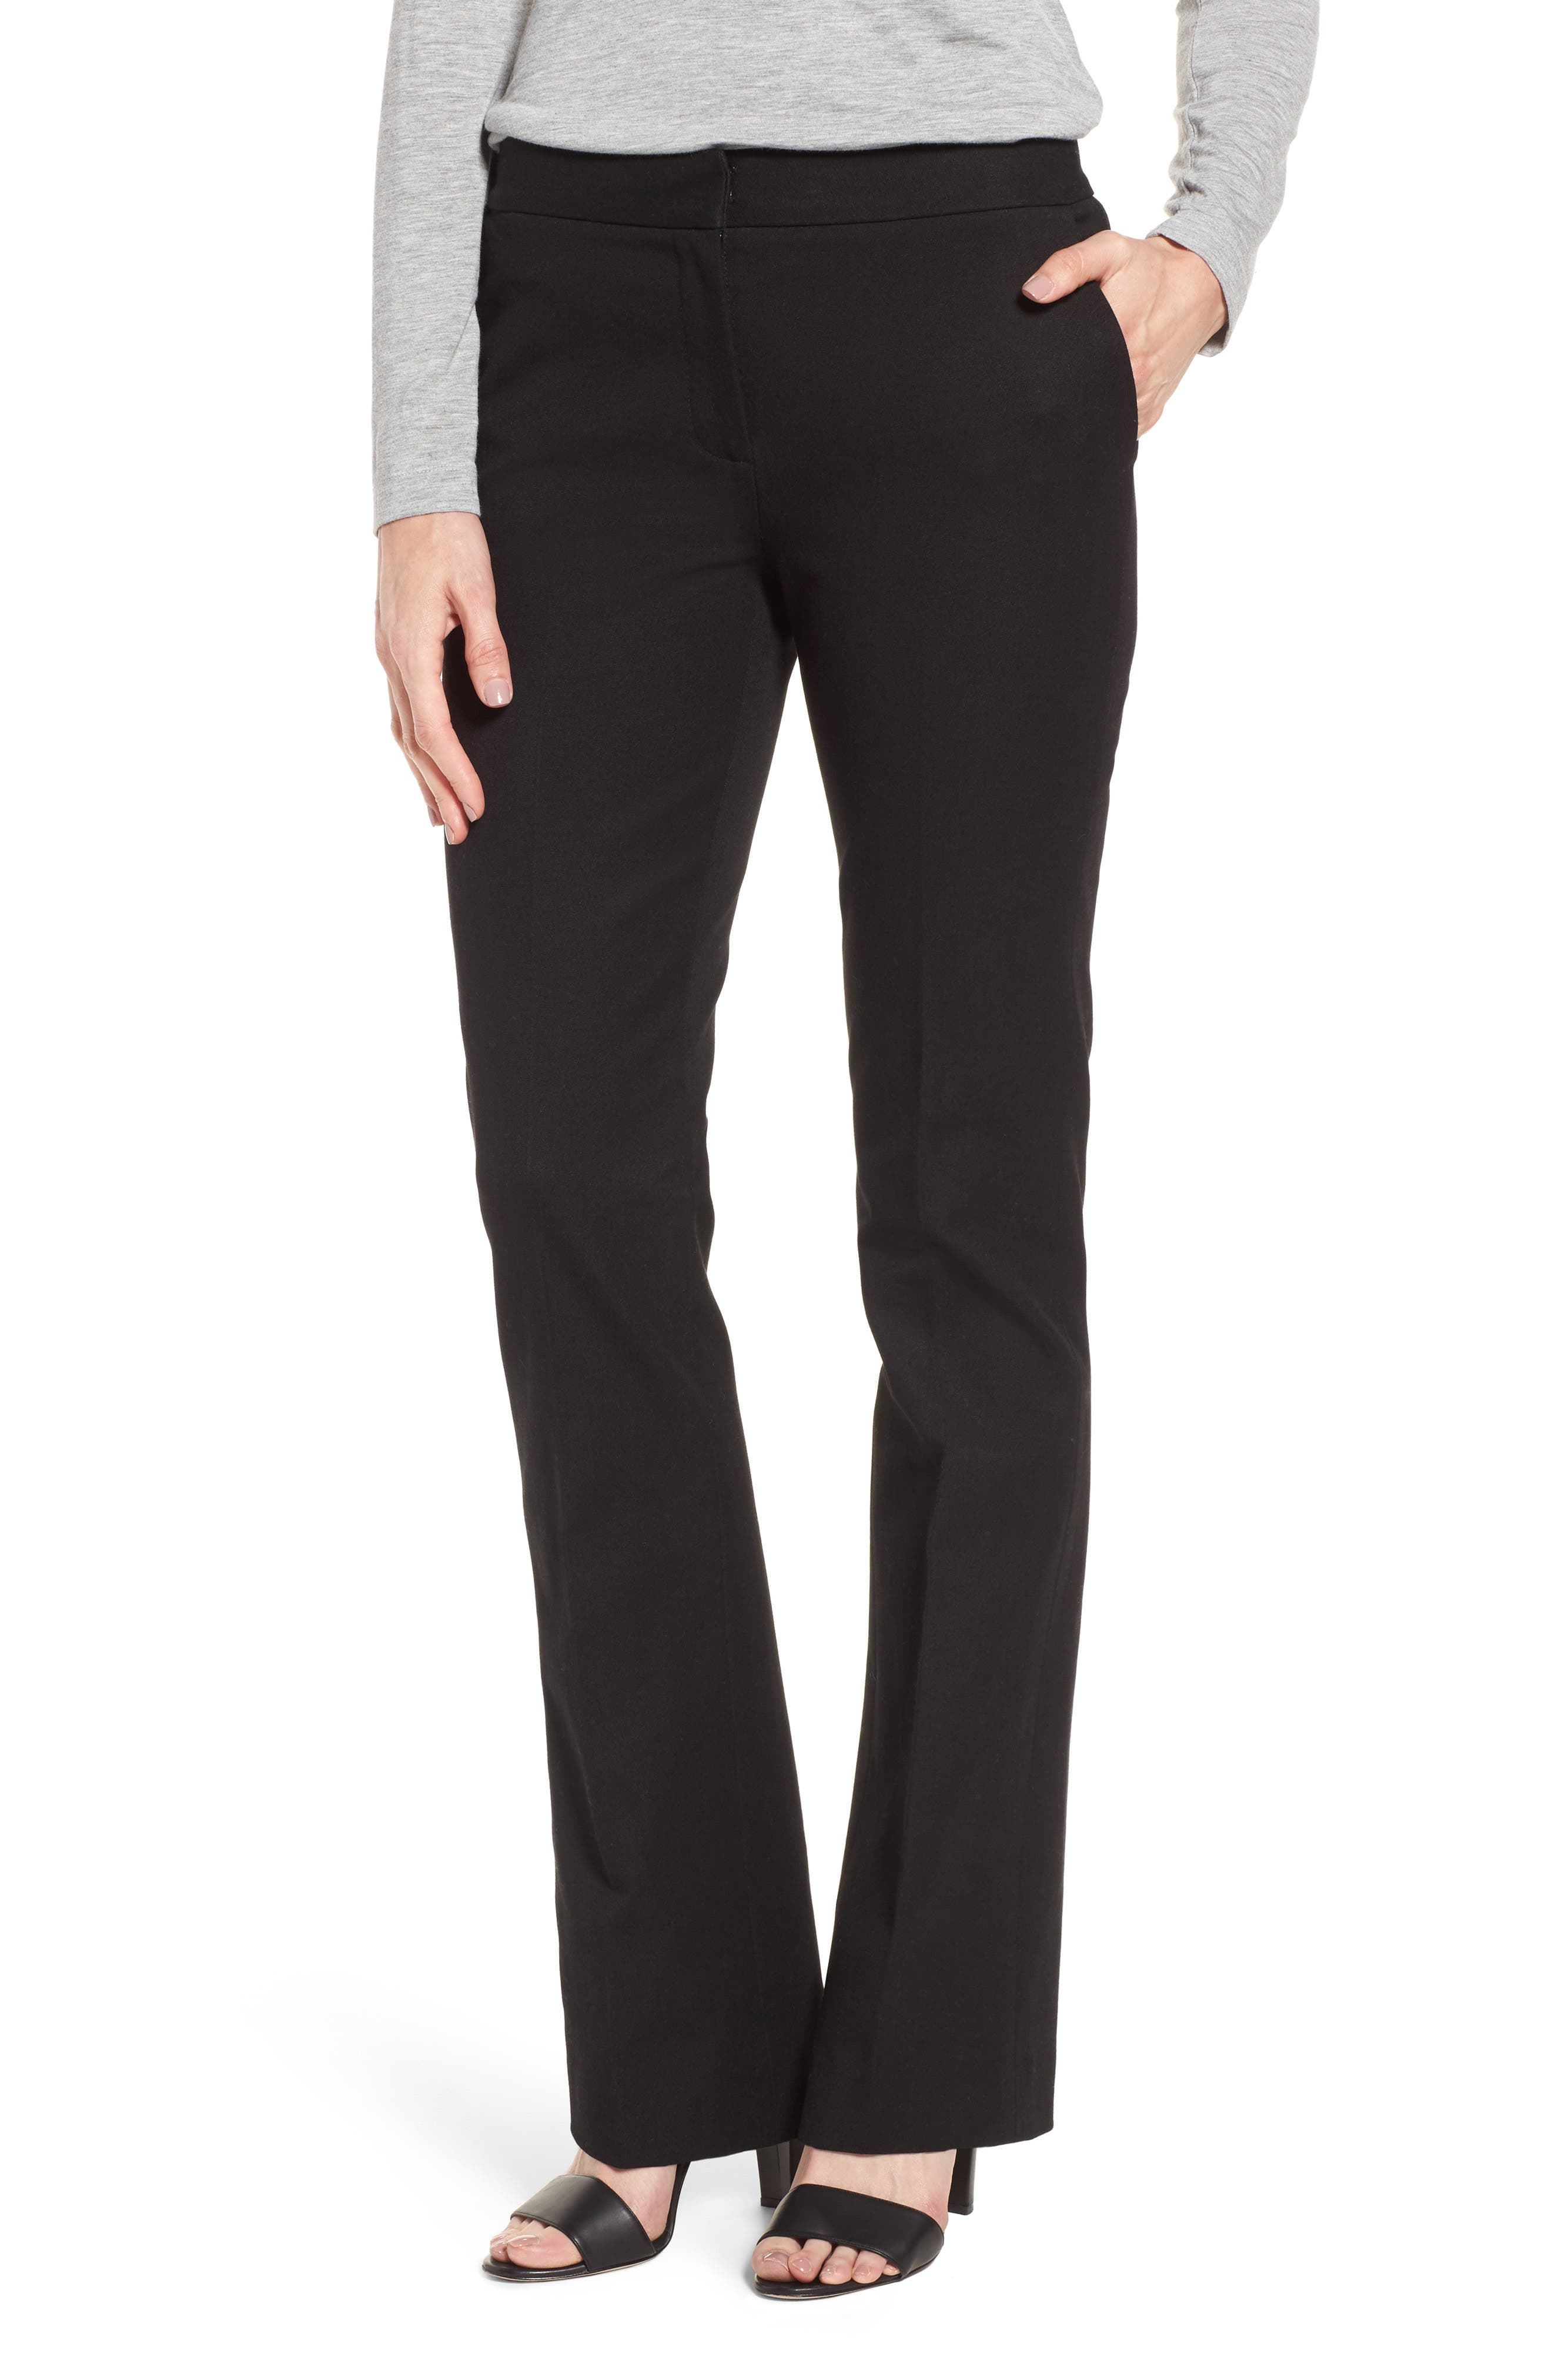 Main Image - Nordstrom Signature Stretch Blend Slim Flare Leg Pants